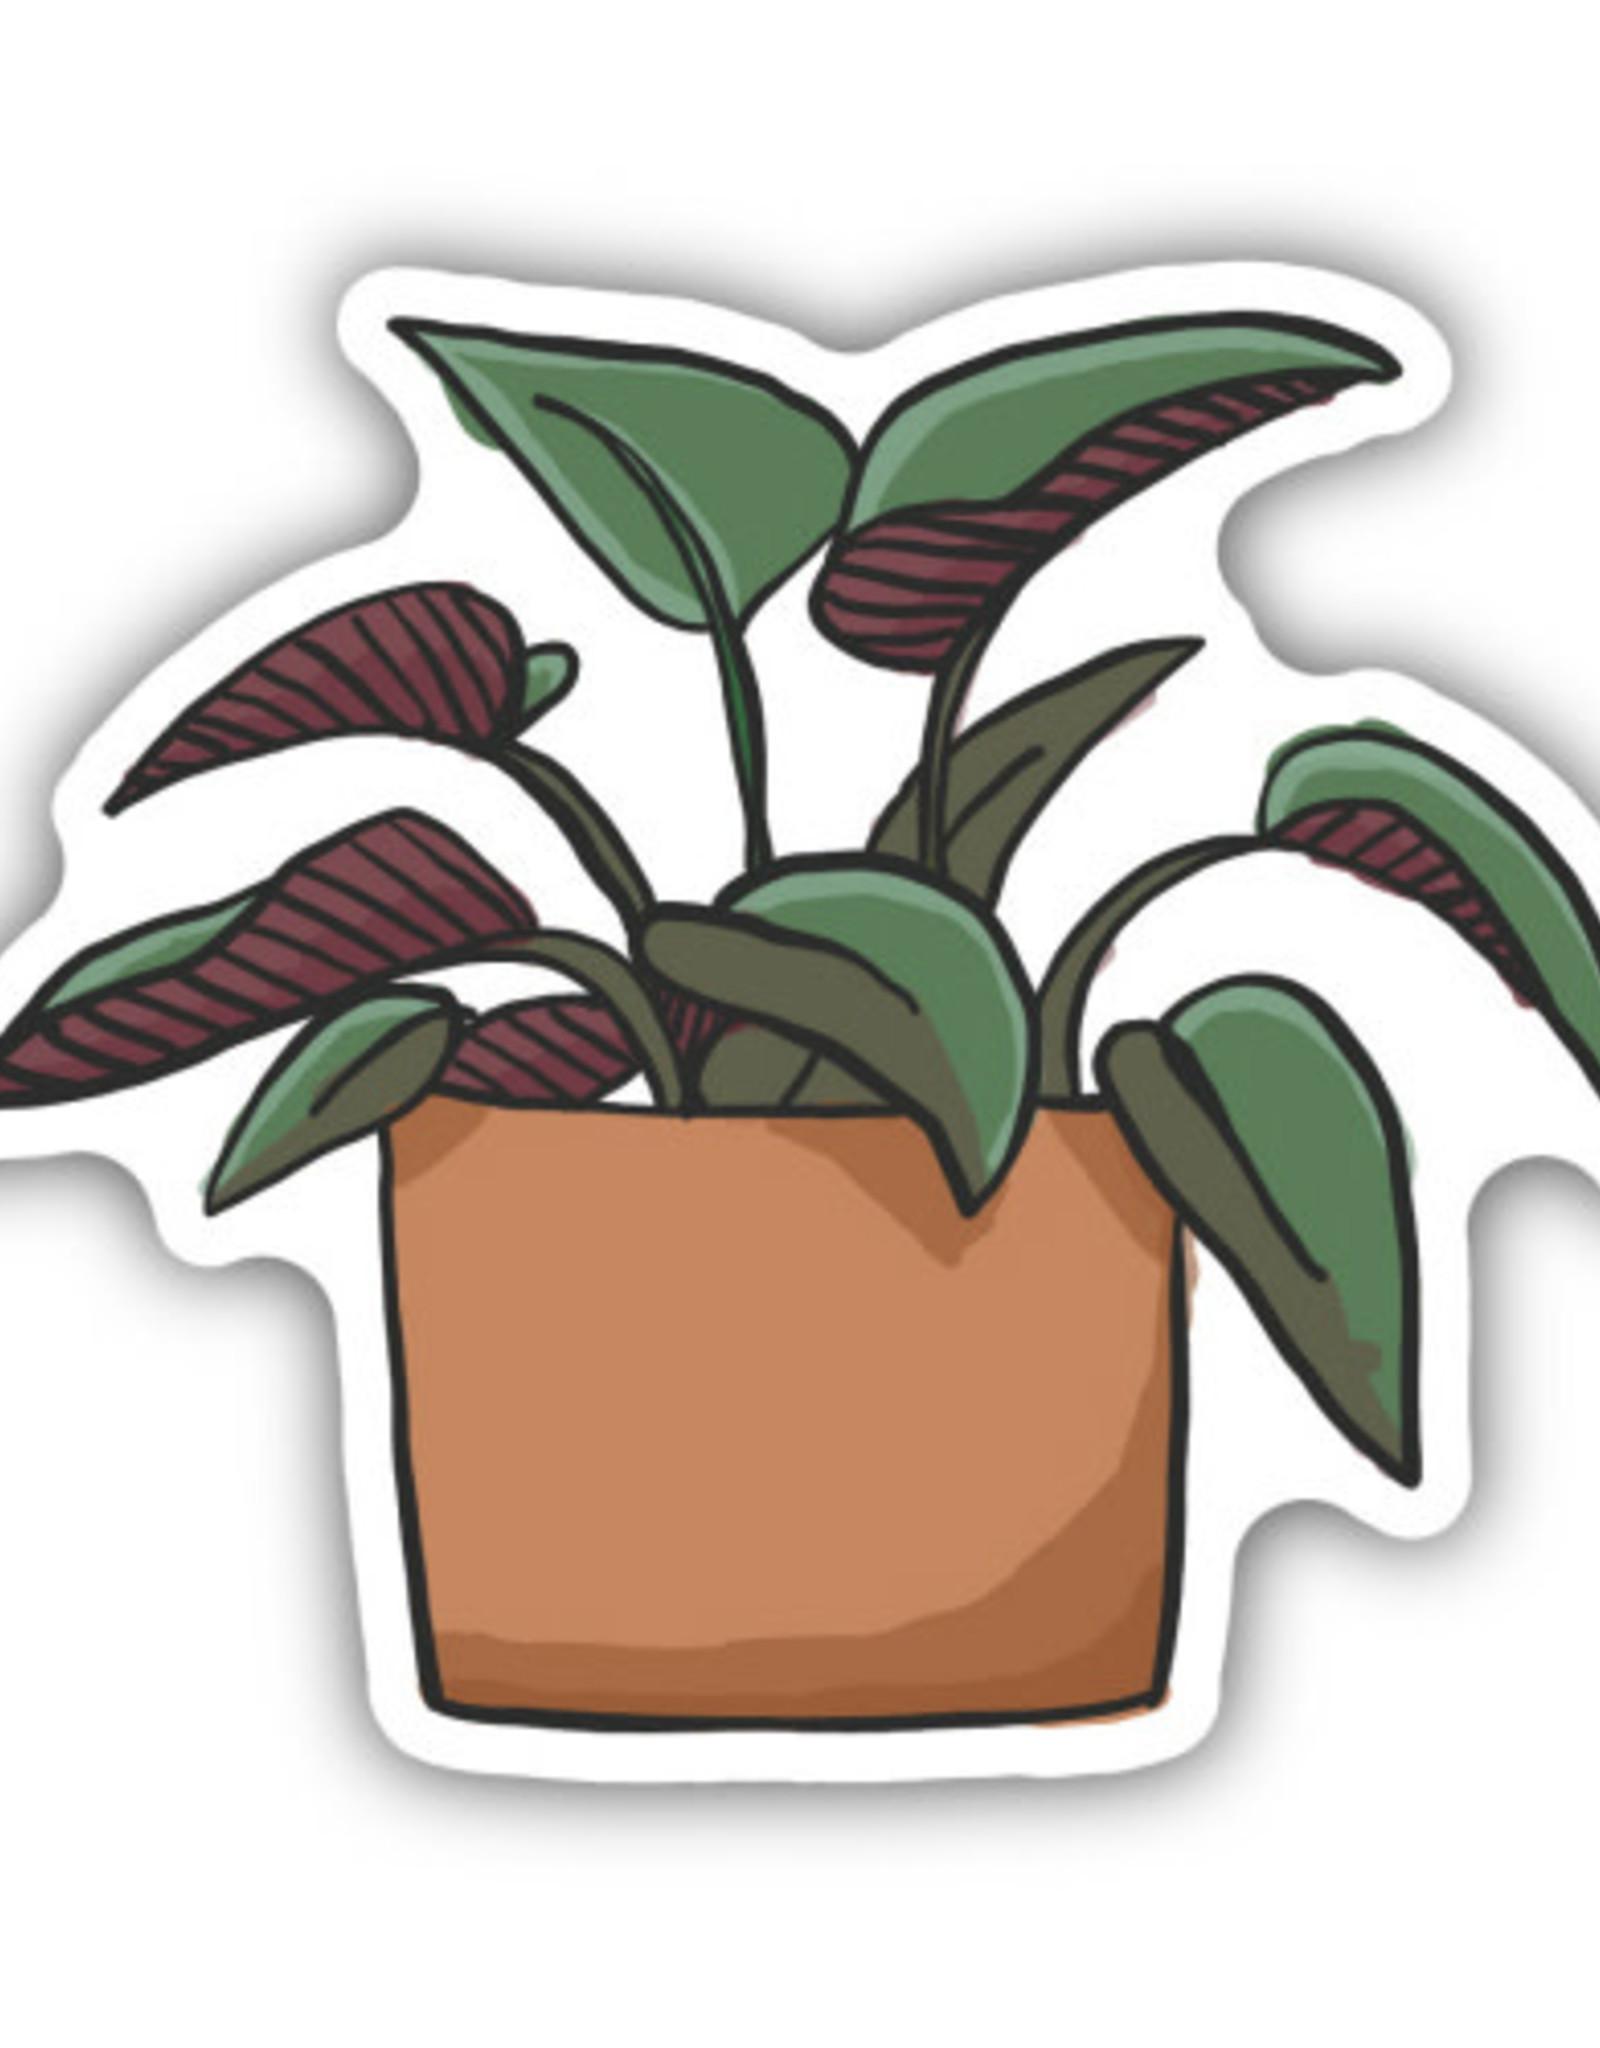 AUTOCOLLANT PLANTE